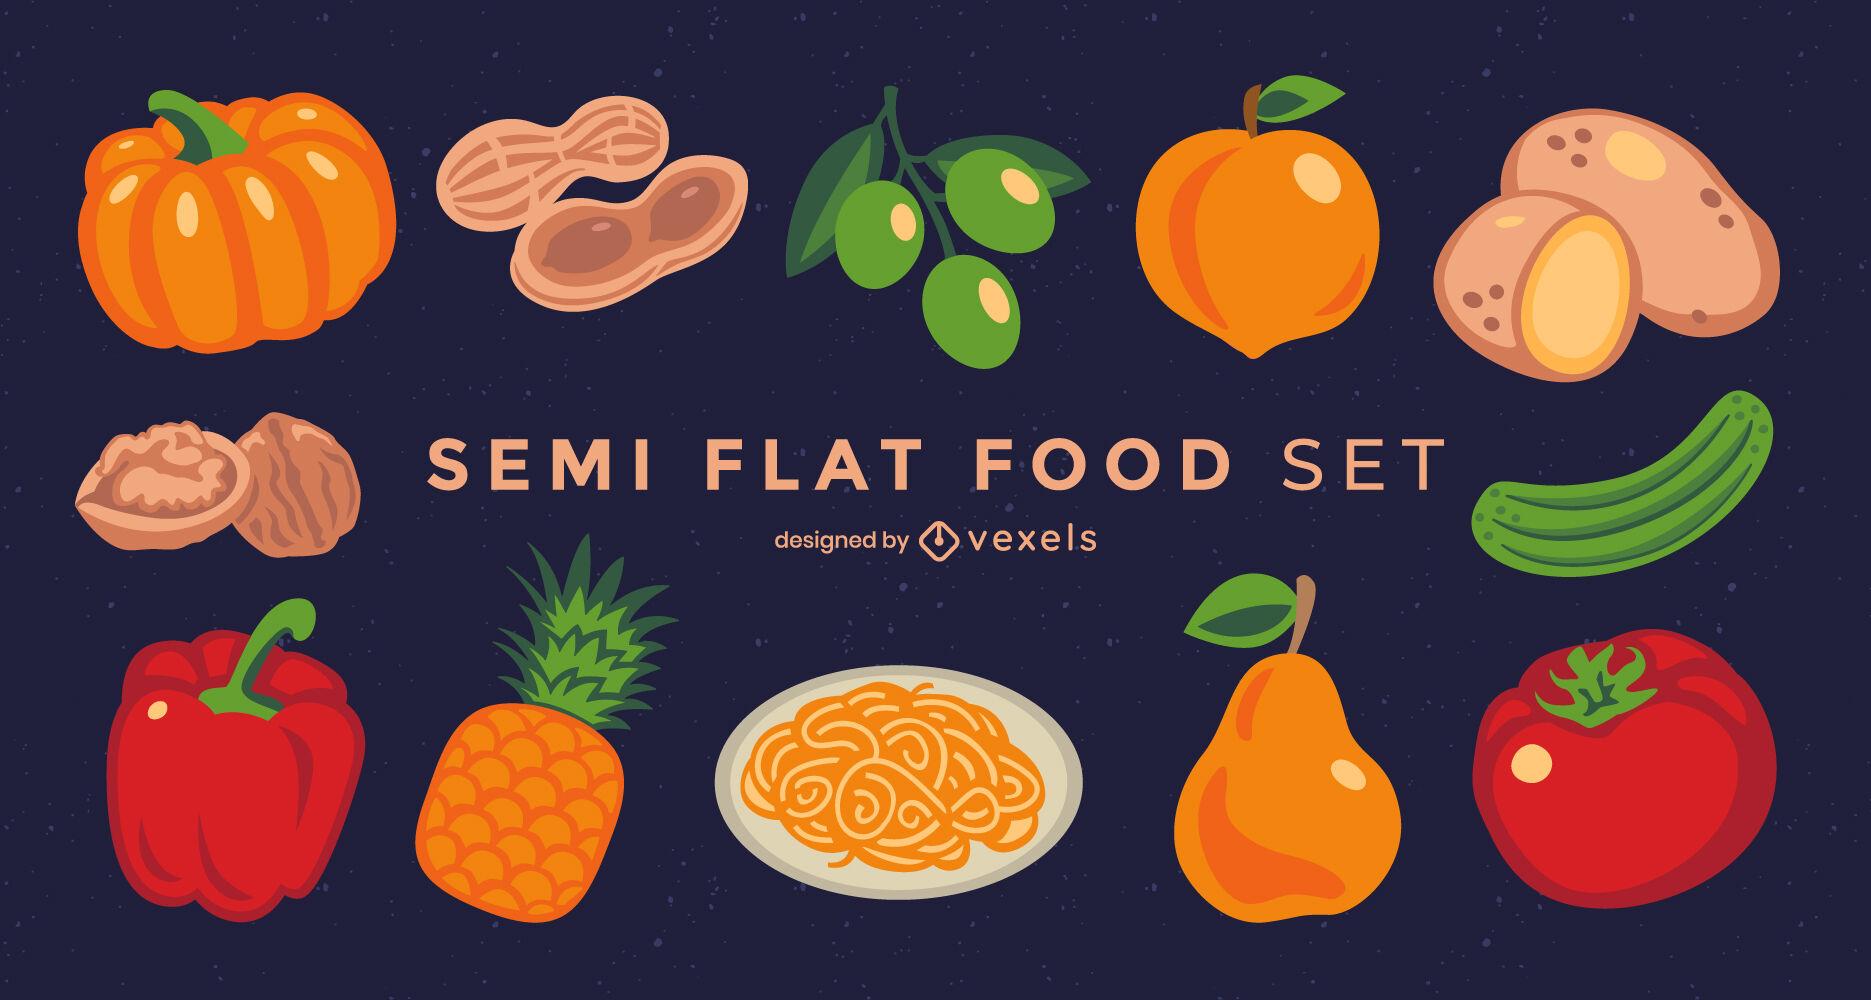 Semi flat food and ingredients set